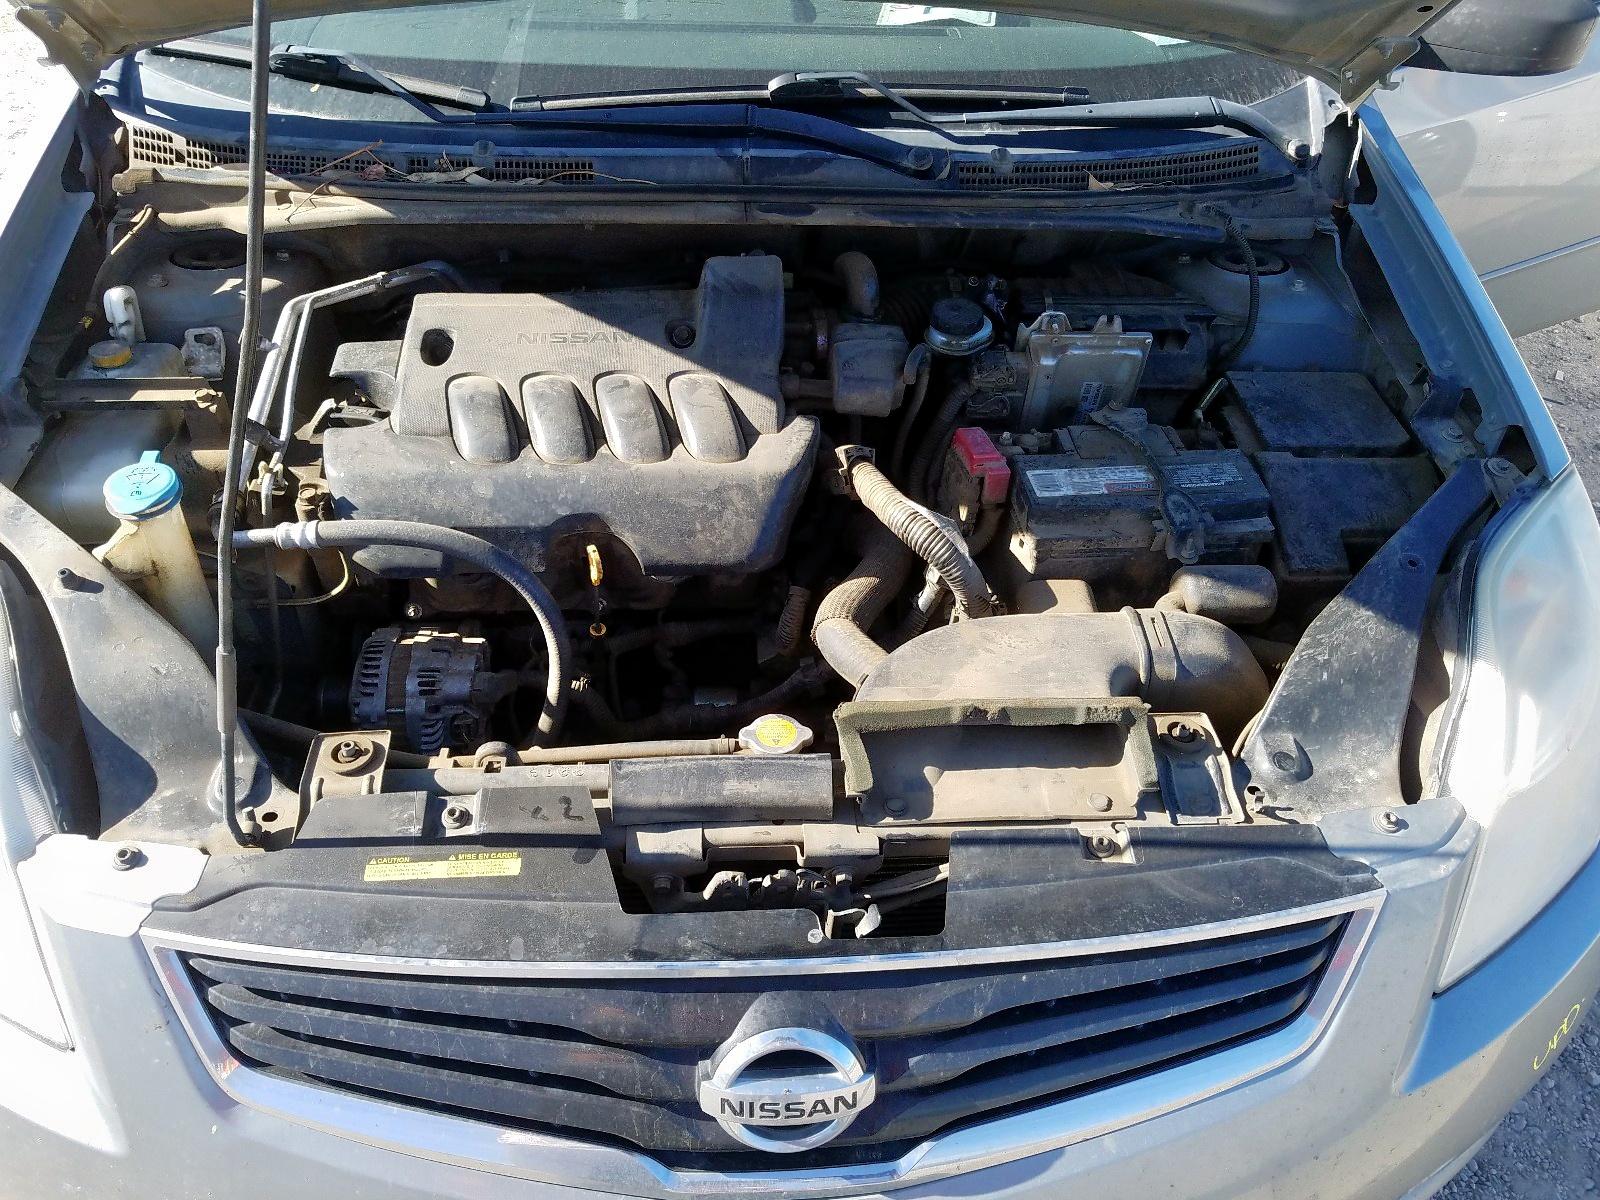 3N1AB6AP5CL773893 - 2012 Nissan Sentra 2.0 2.0L inside view